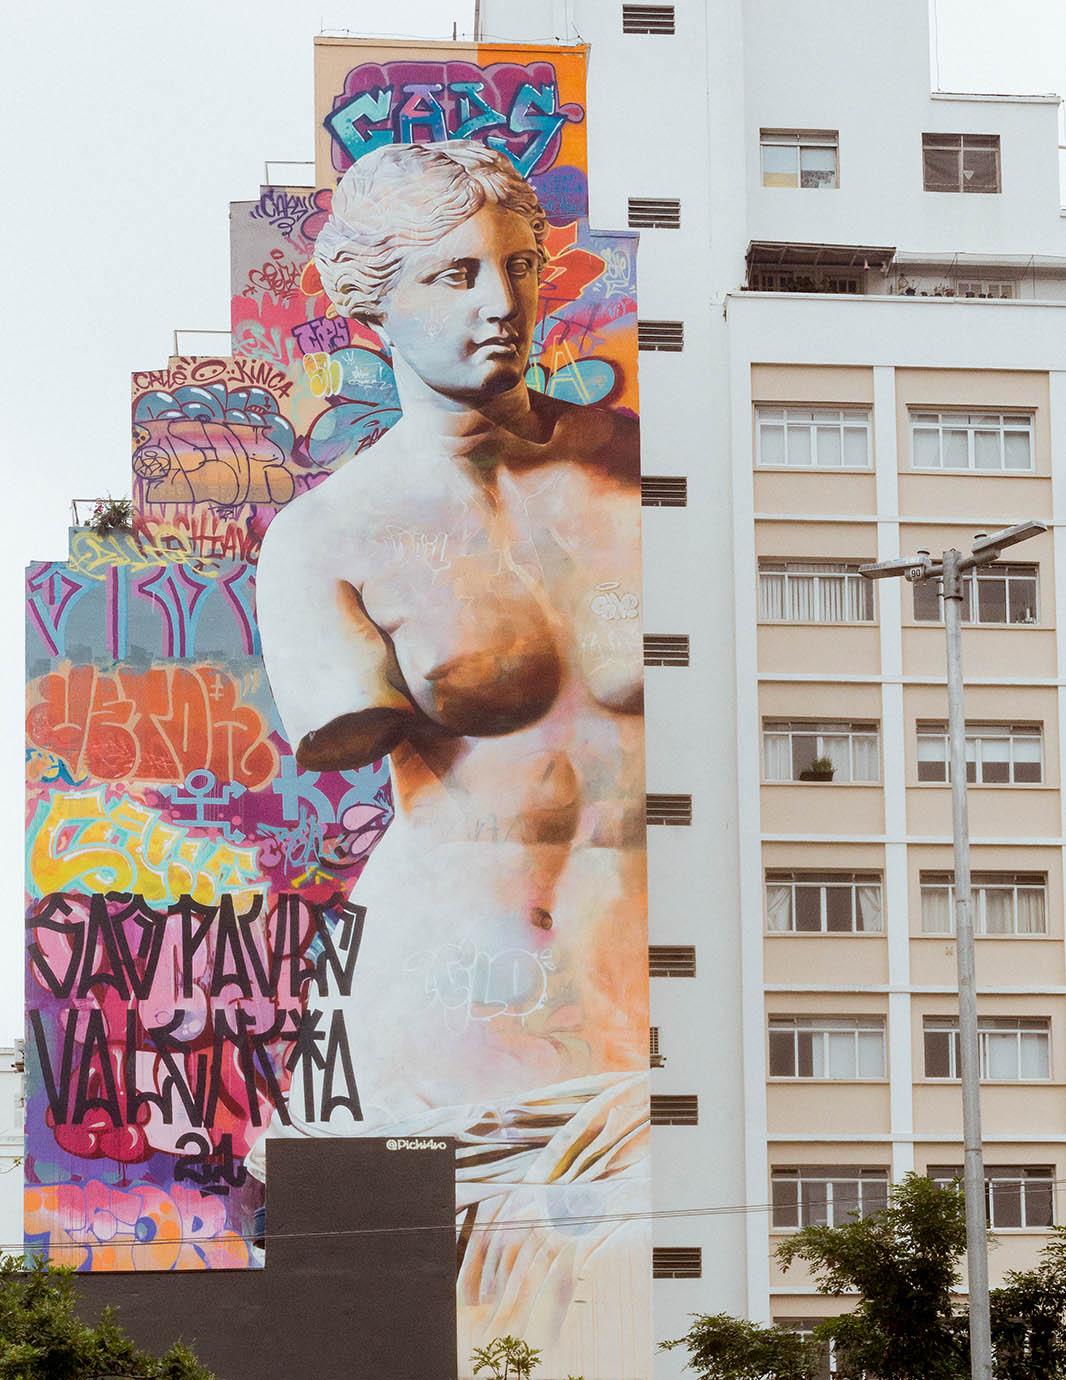 Venus NaLata Sao Paulo